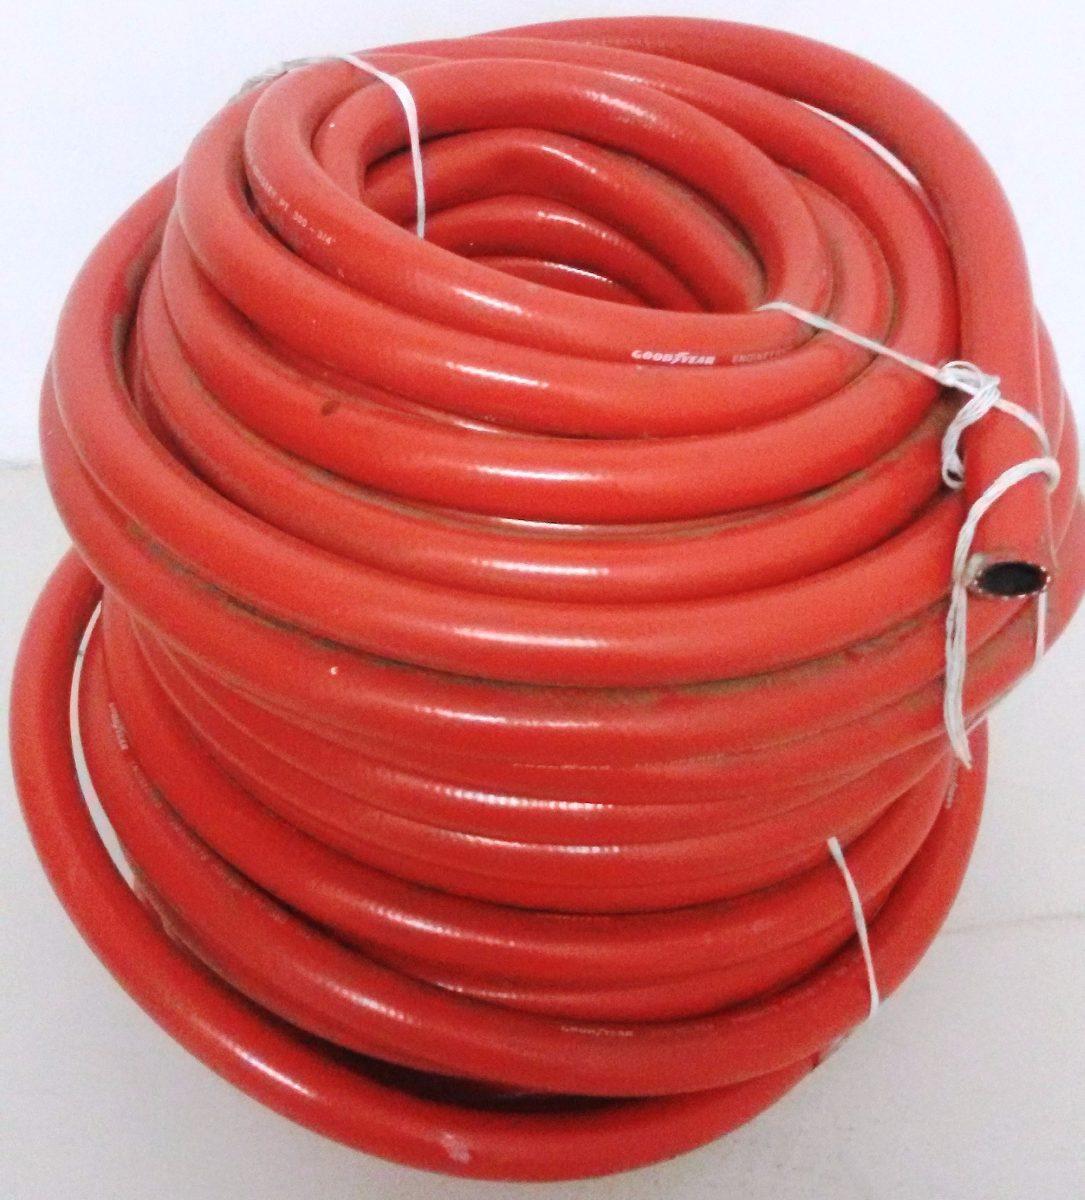 Manguera alta presi n para aire y agua de 3 8 bs 390 for Manguera para aire comprimido